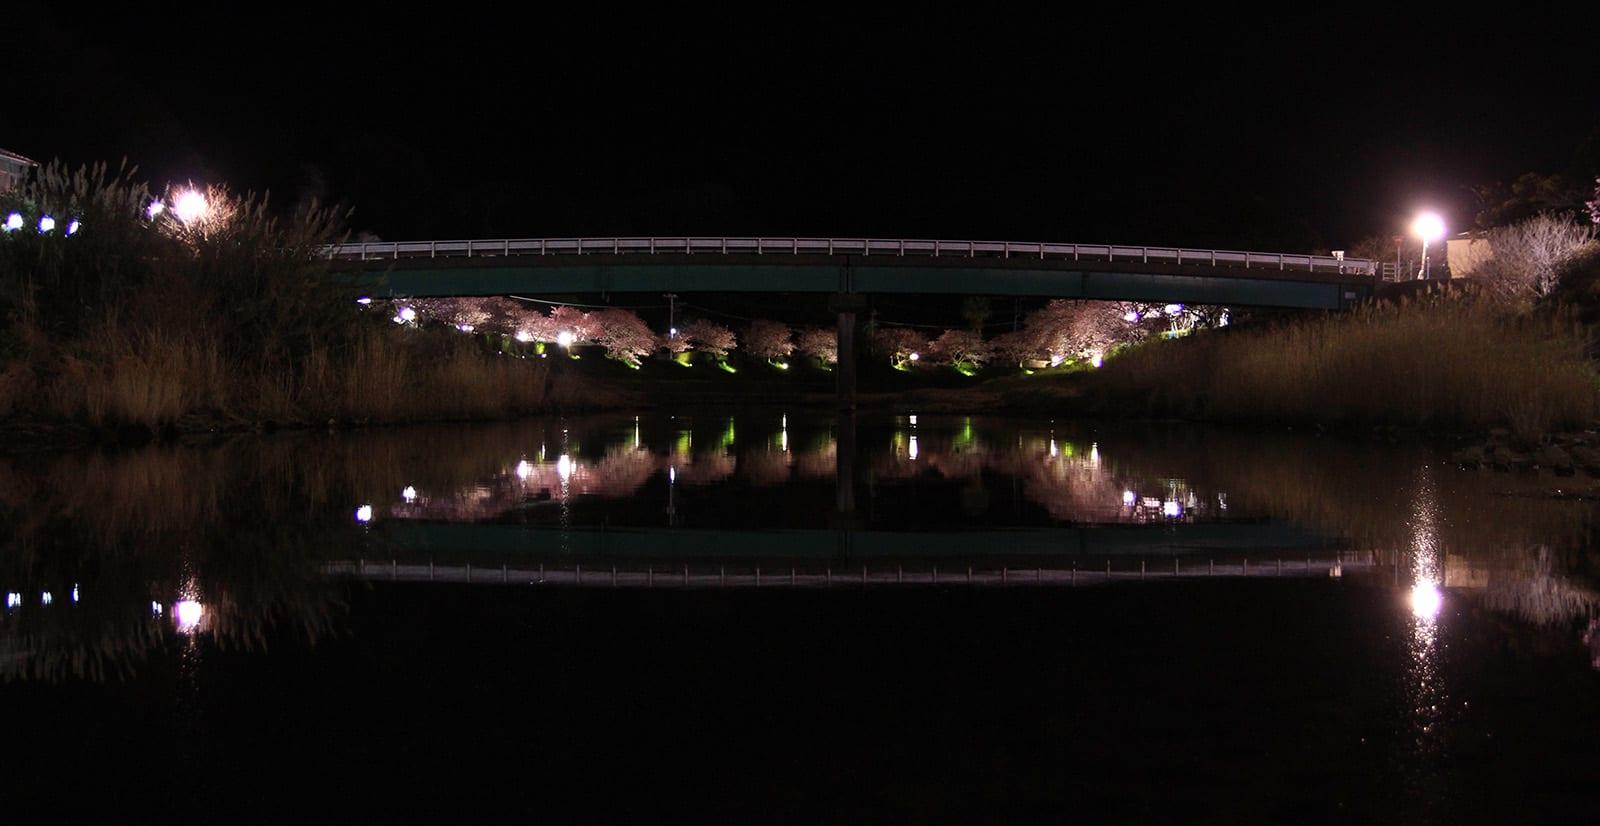 Ngắm Kawazu-zakura và trời sao tại Miurakaigan, Kanazawa-ken 8